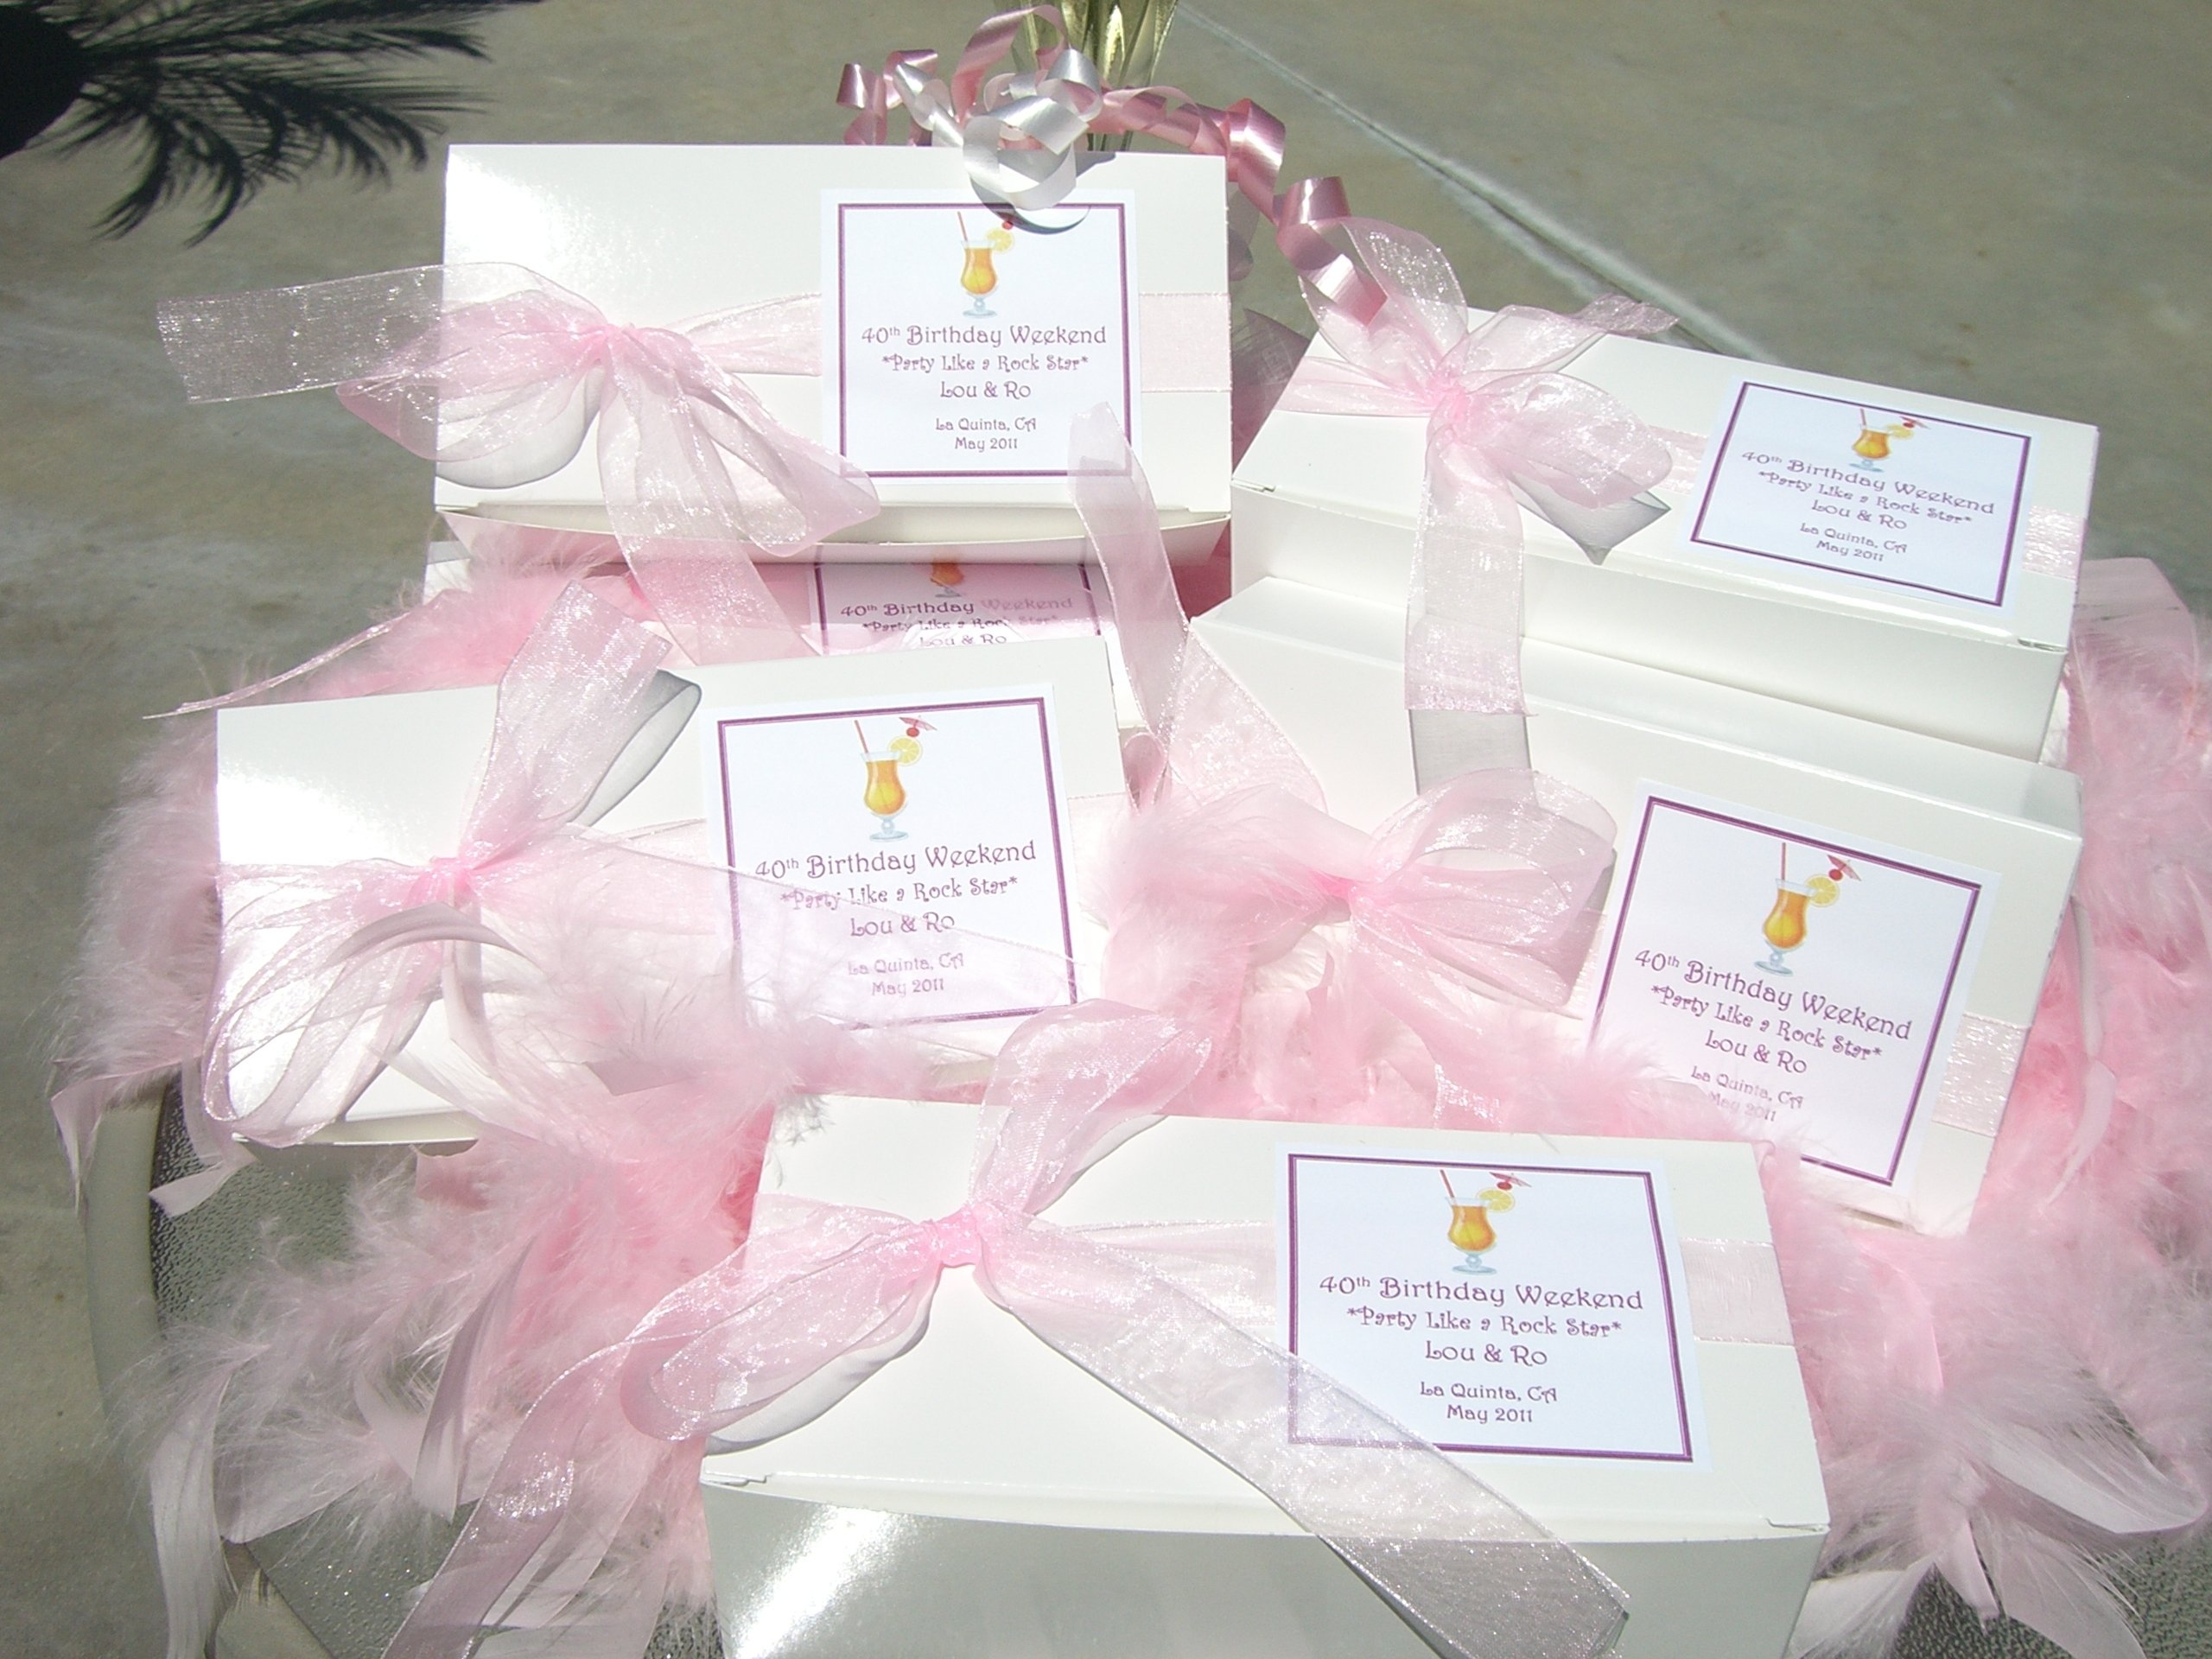 10 Pretty Hostess Gift Ideas For Bridal Shower photo hawaiian bridal shower gift ideas image 2020